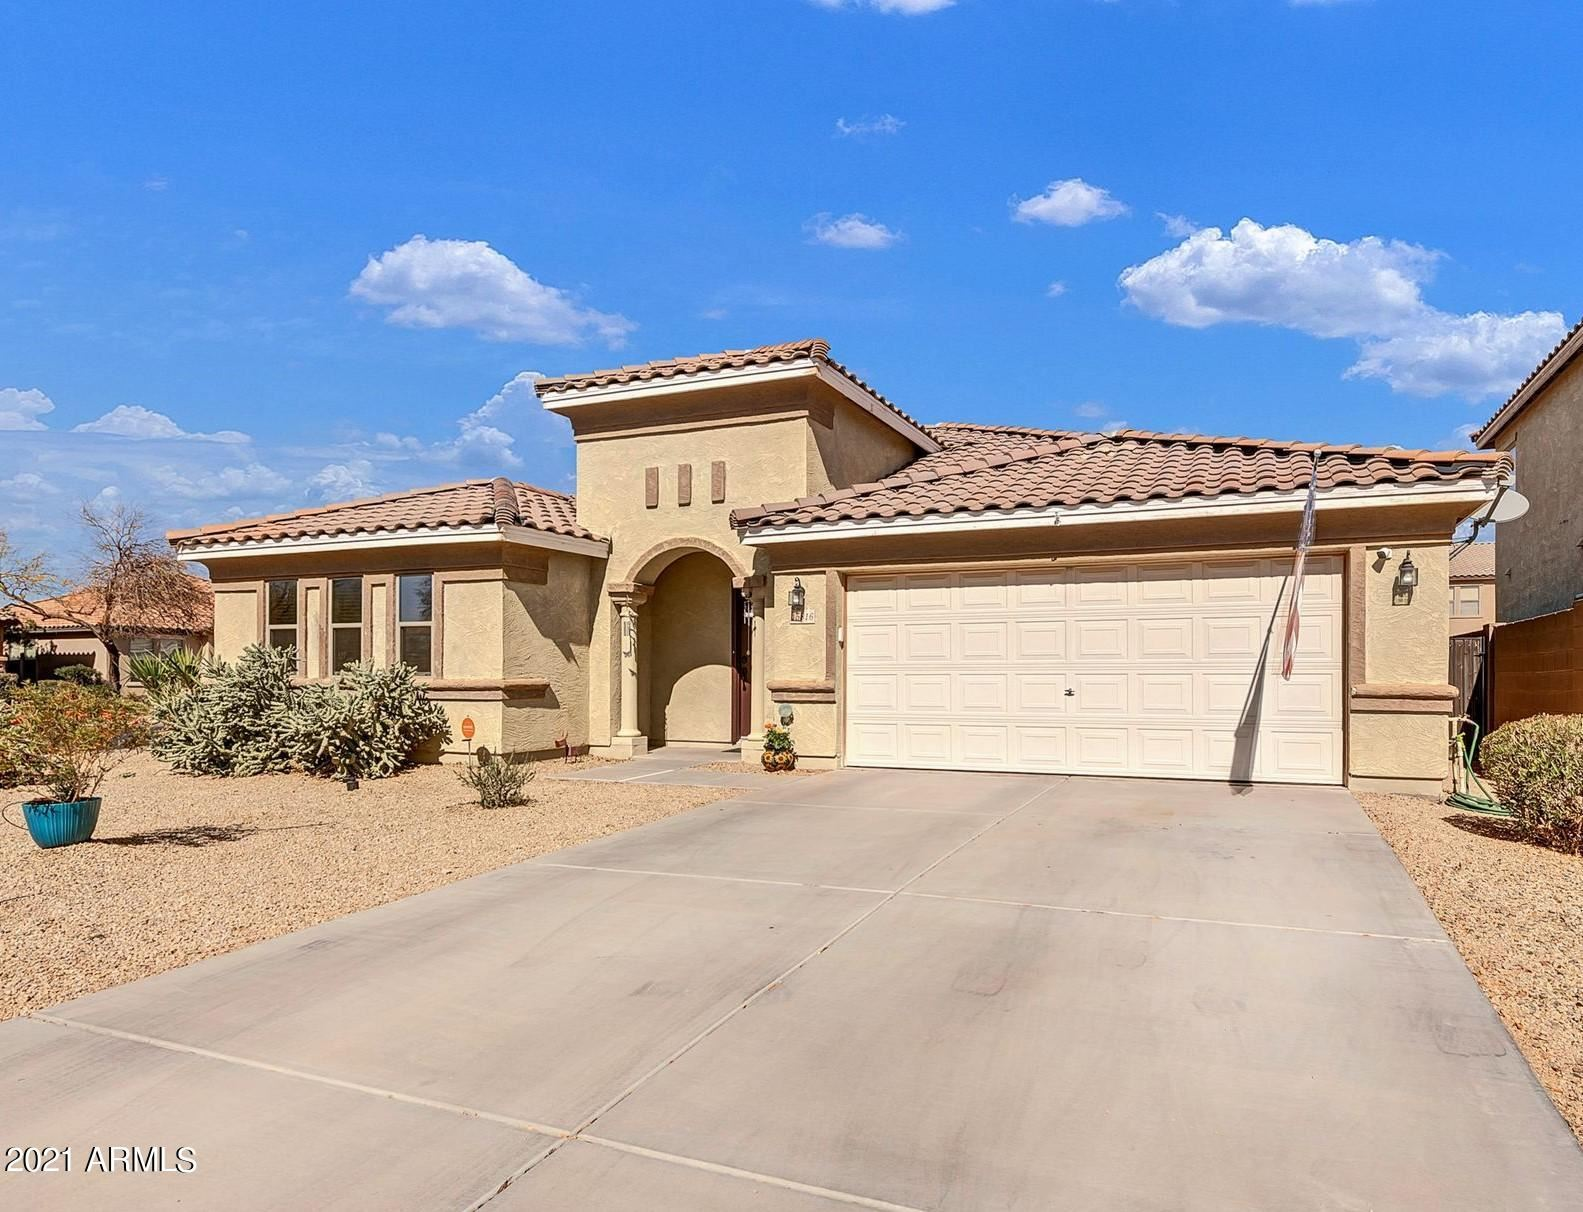 Photo of 45816 W MORNING VIEW Lane, Maricopa, AZ 85139 (MLS # 6200551)